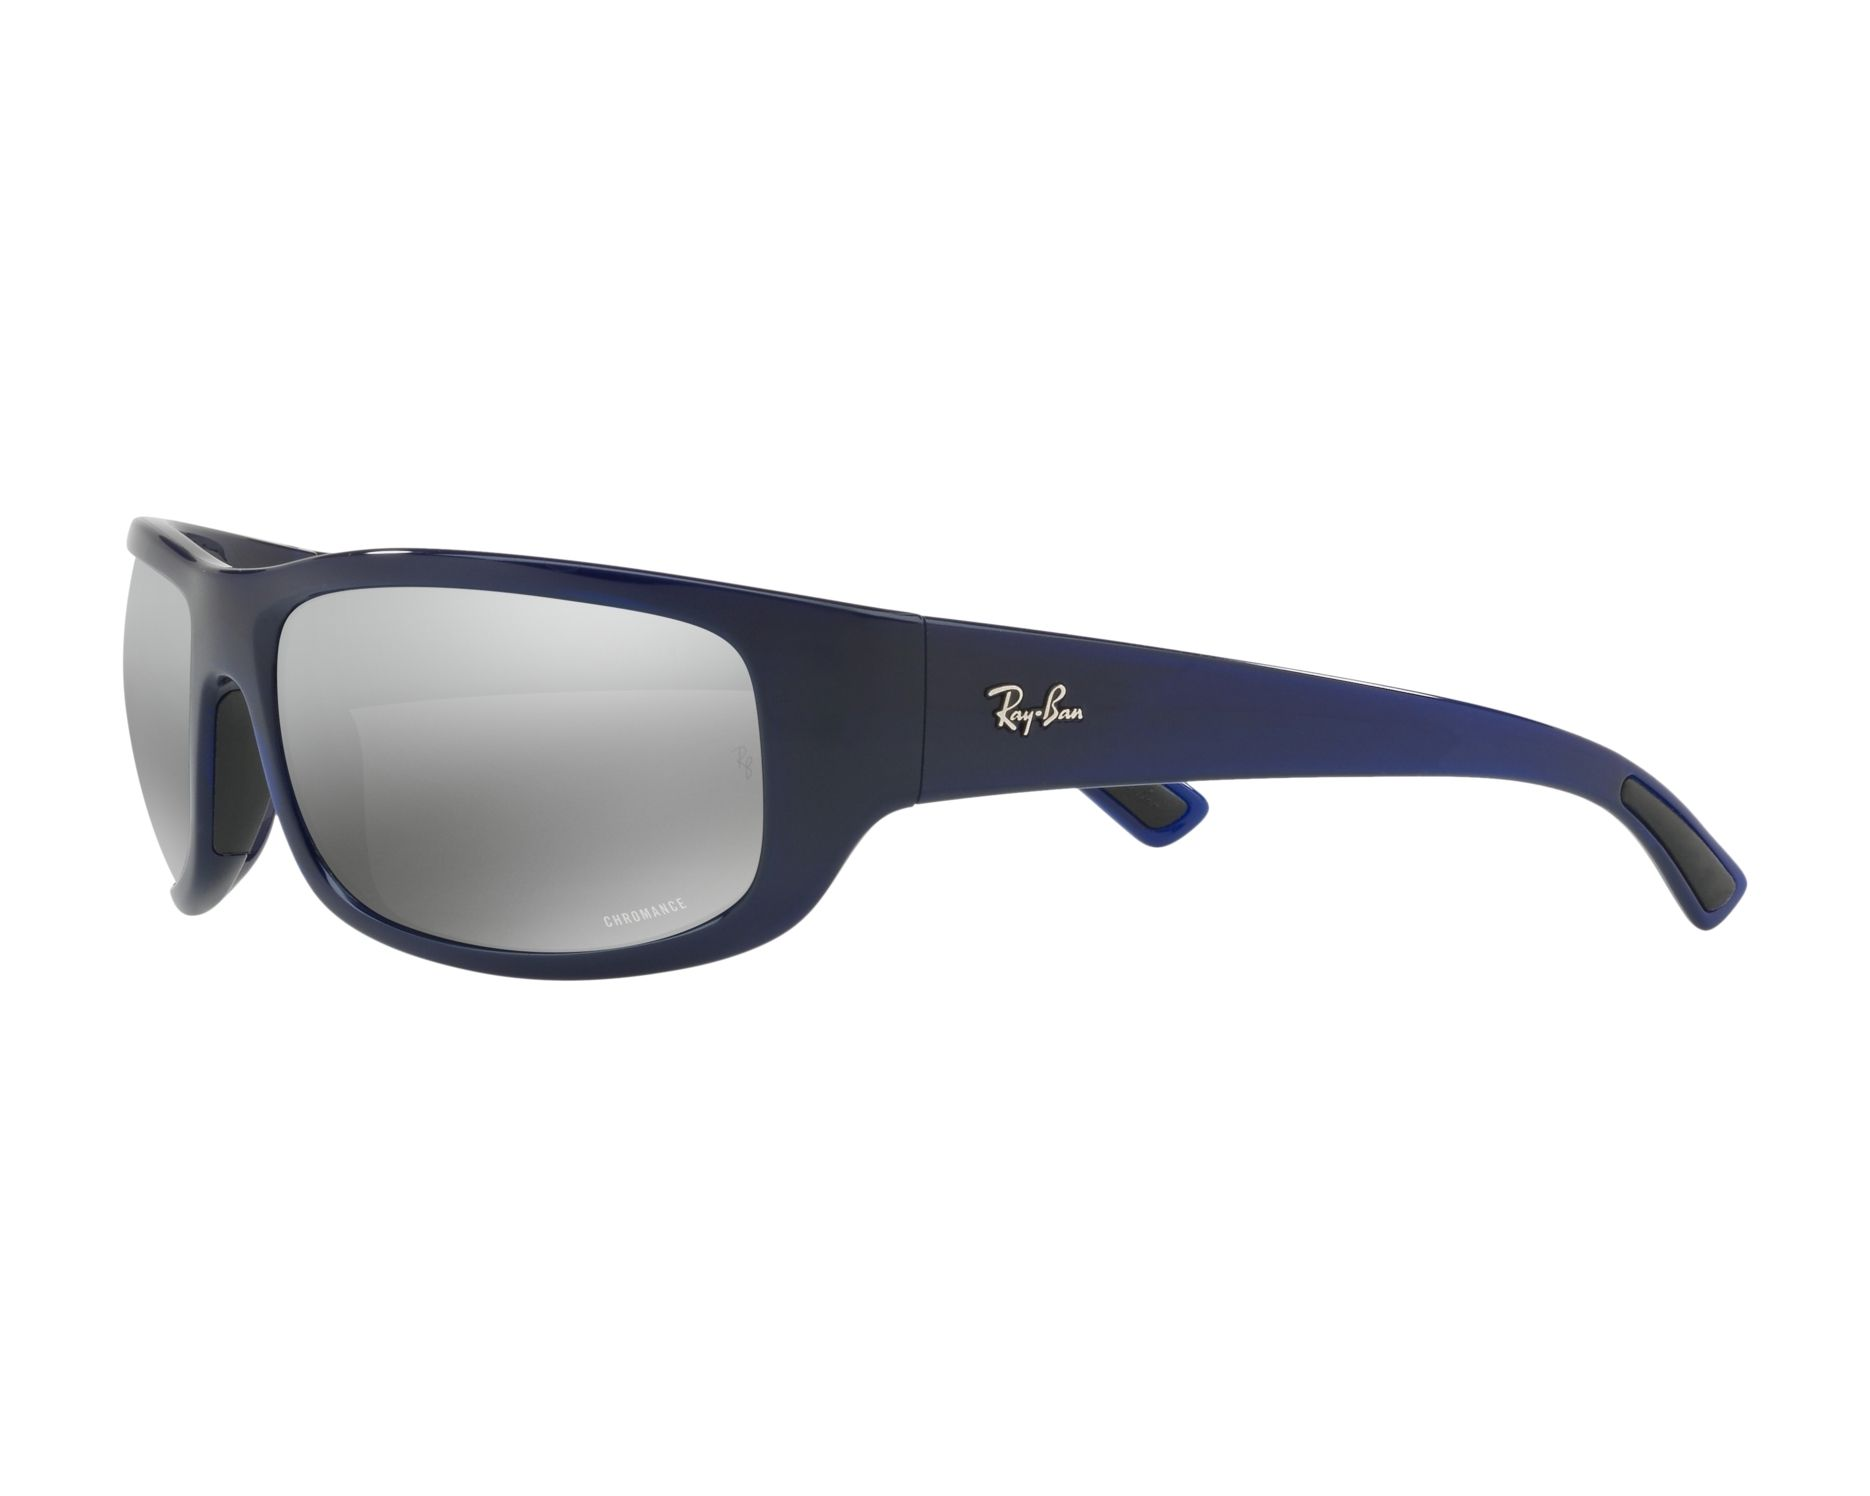 Sunglasses Ray-Ban RB-4283-CH 629 5J 64-18 Blue 3c56843ae0